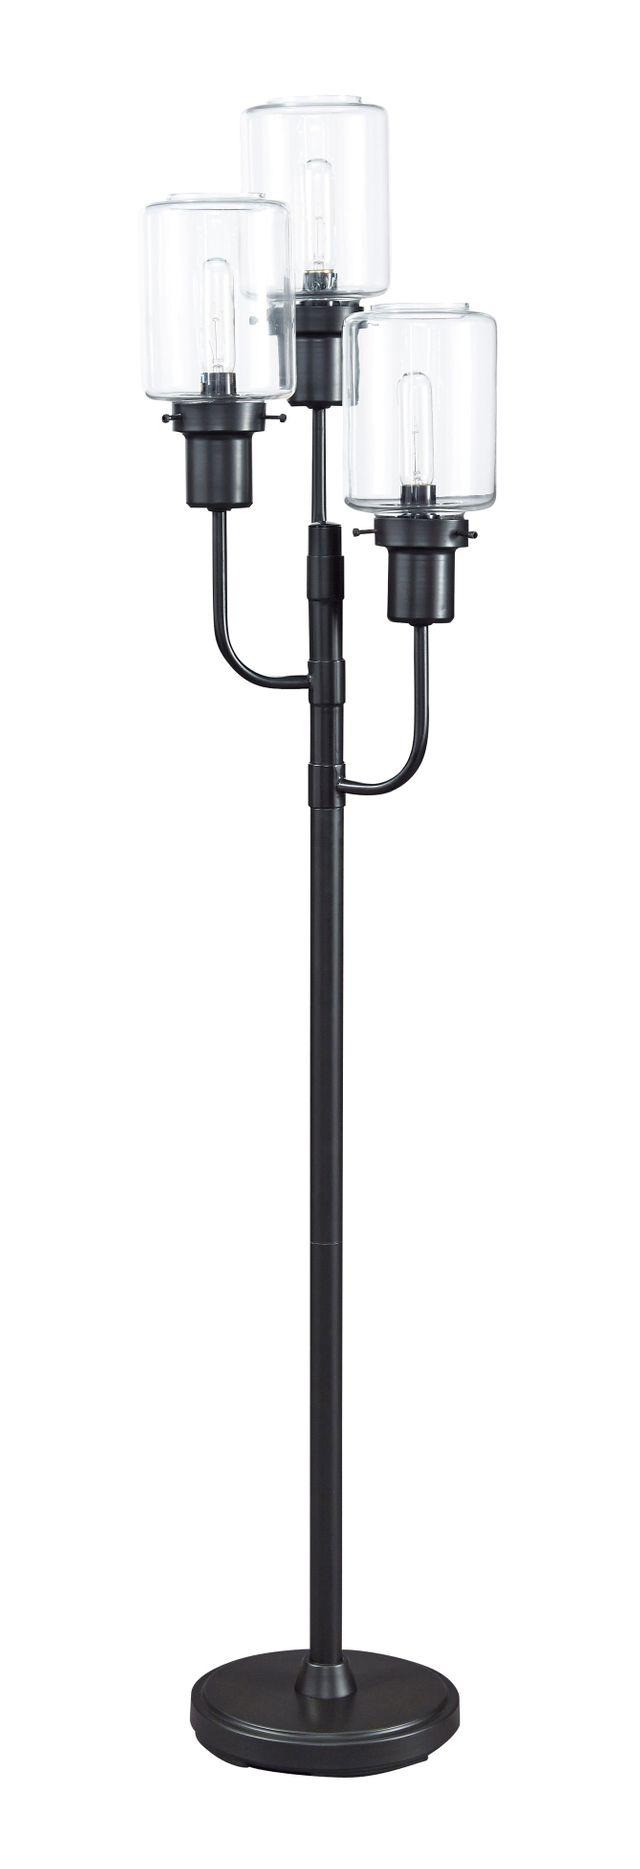 Signature Design by Ashley® Jaak Bronze Finish Metal Floor Lamp-L207171